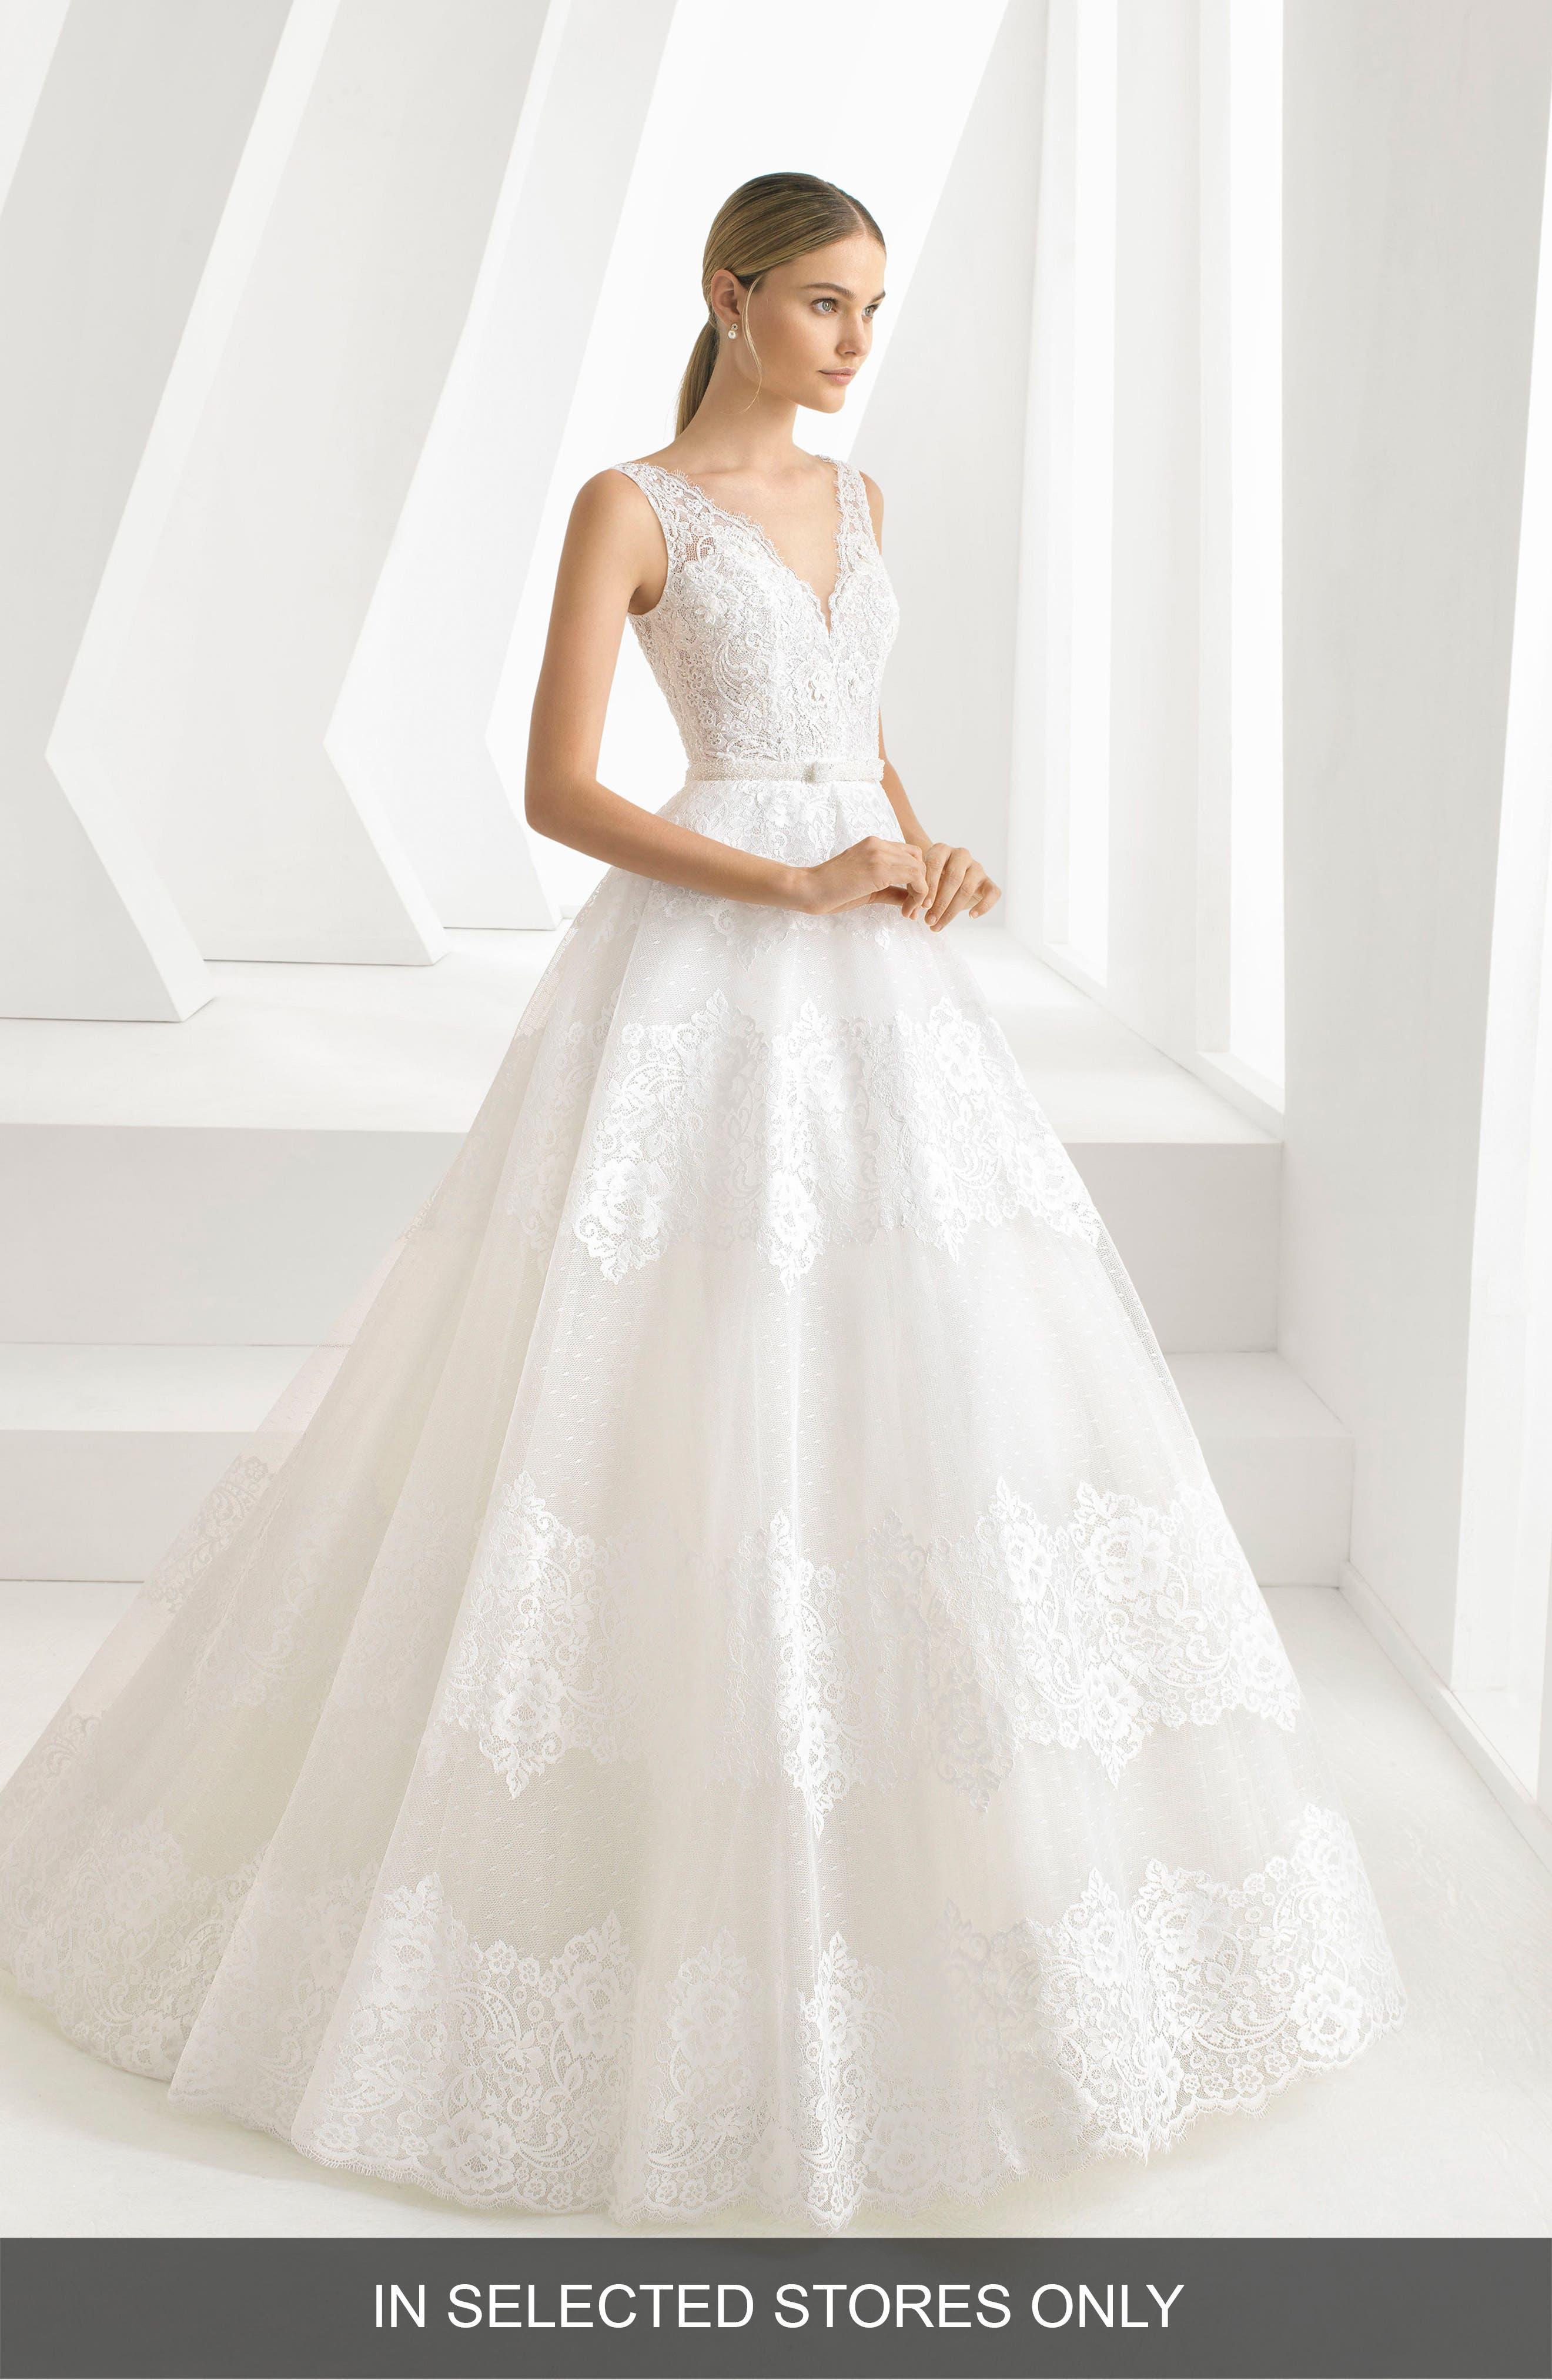 Delfina Lace & Bead A-Line Gown,                             Main thumbnail 1, color,                             NATURAL